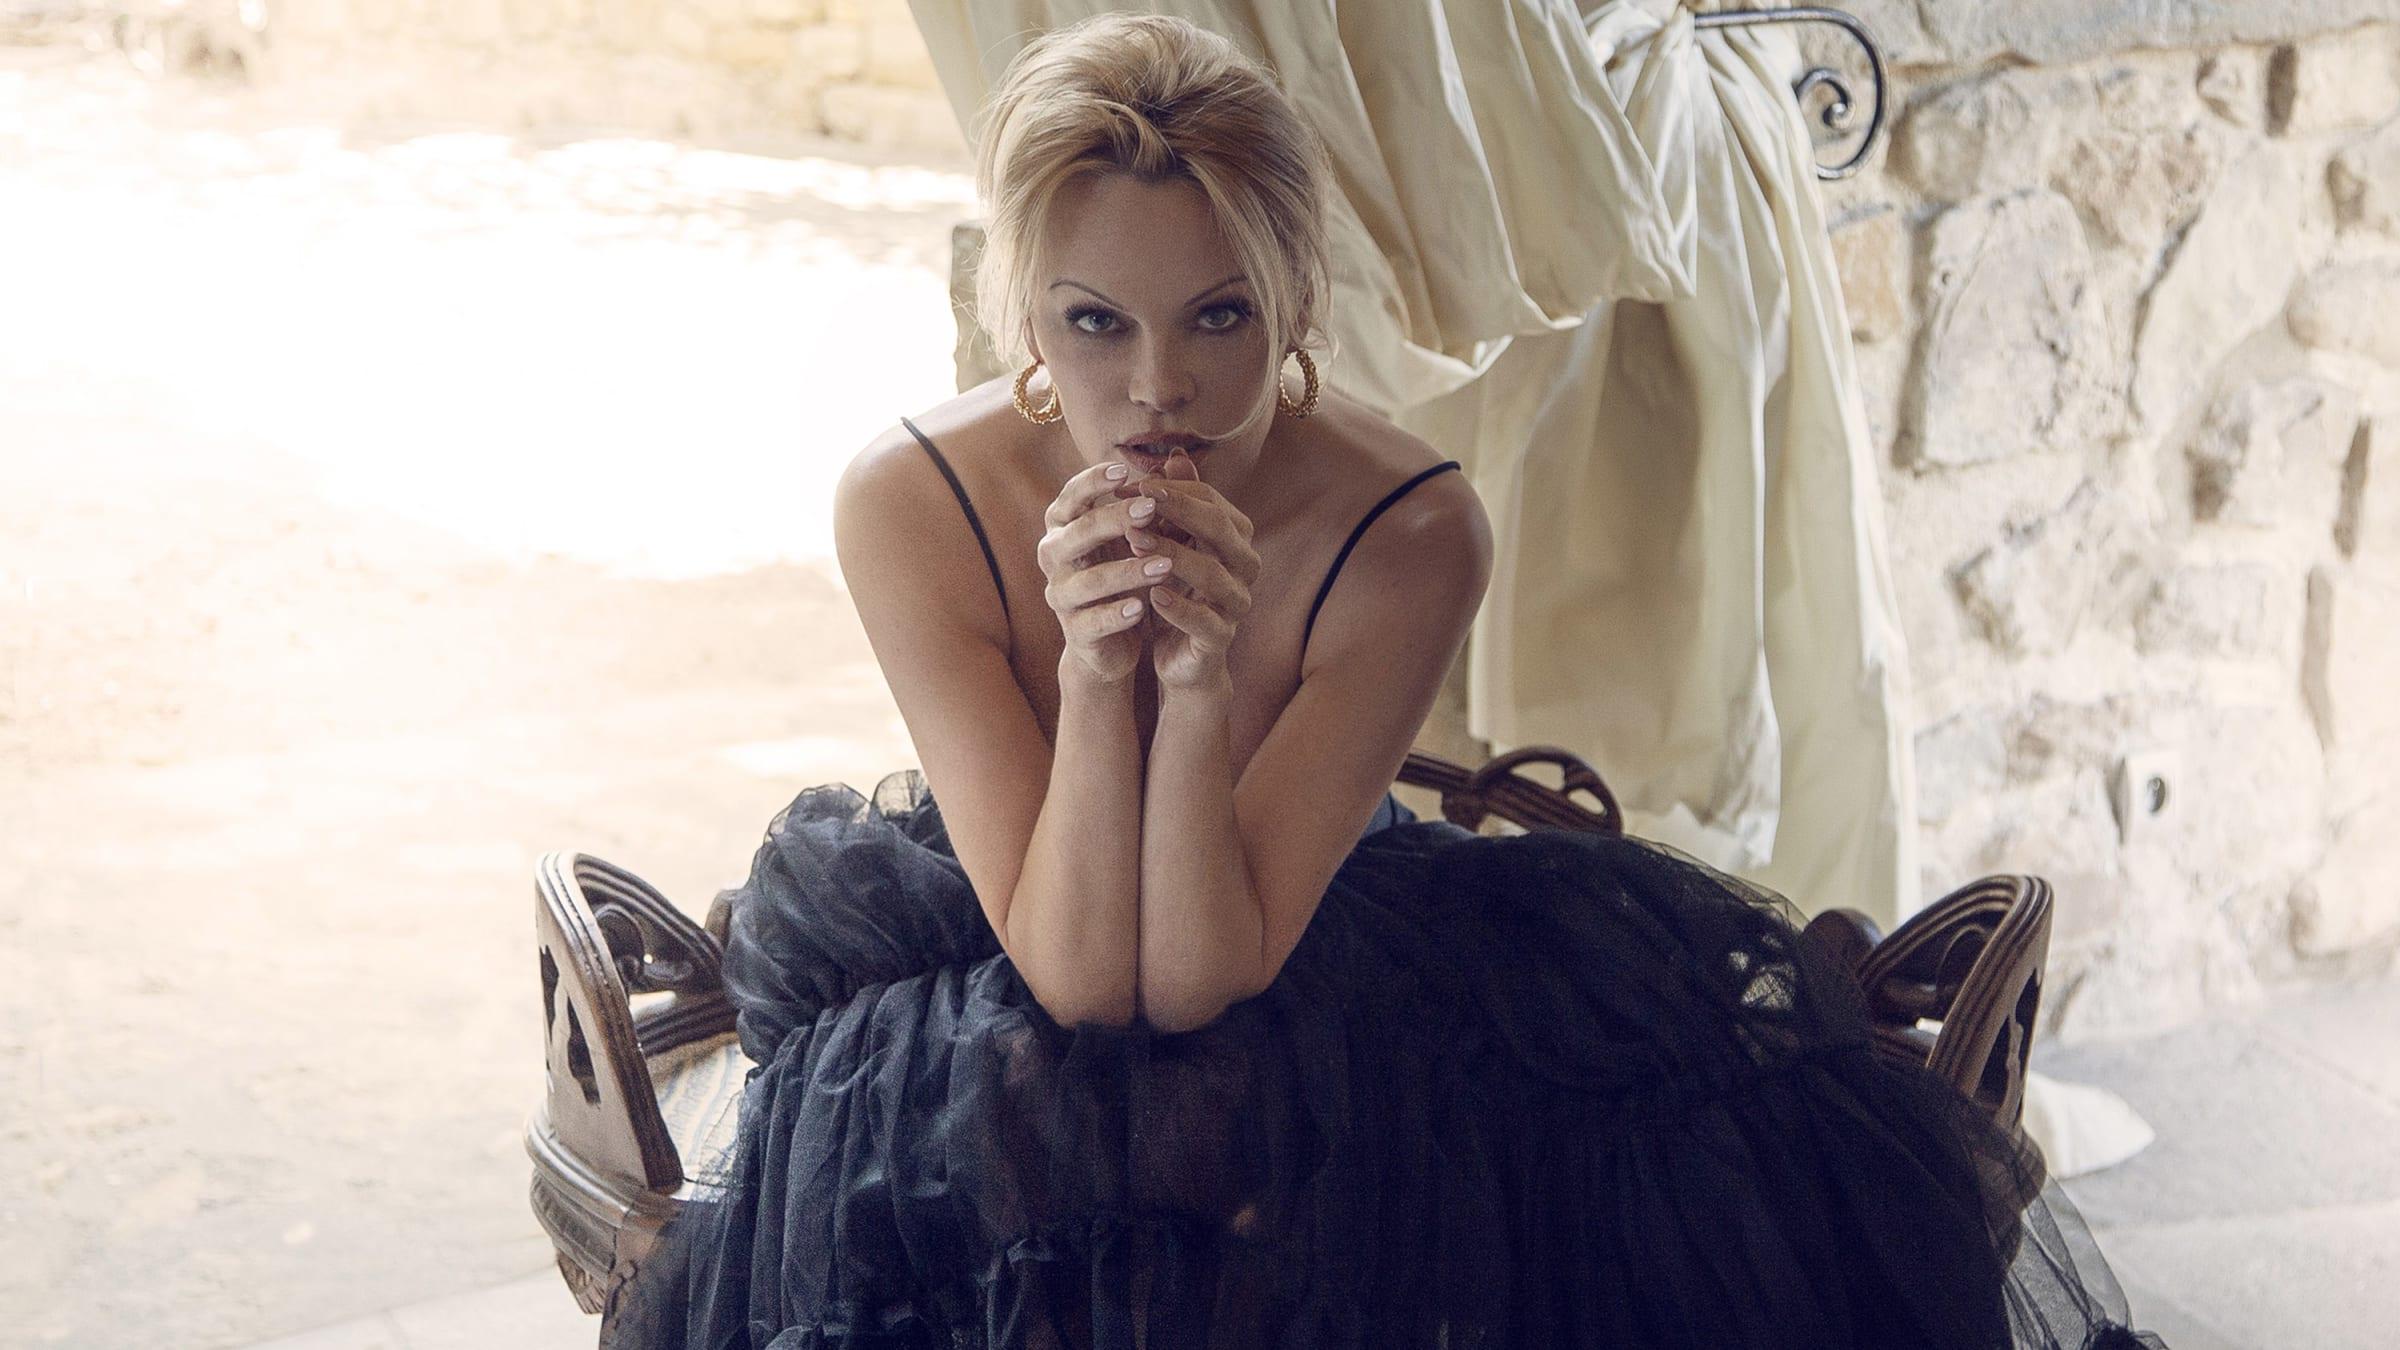 Petunia reccomend Pamela Anderson and Brett Michaels Sex Tape.